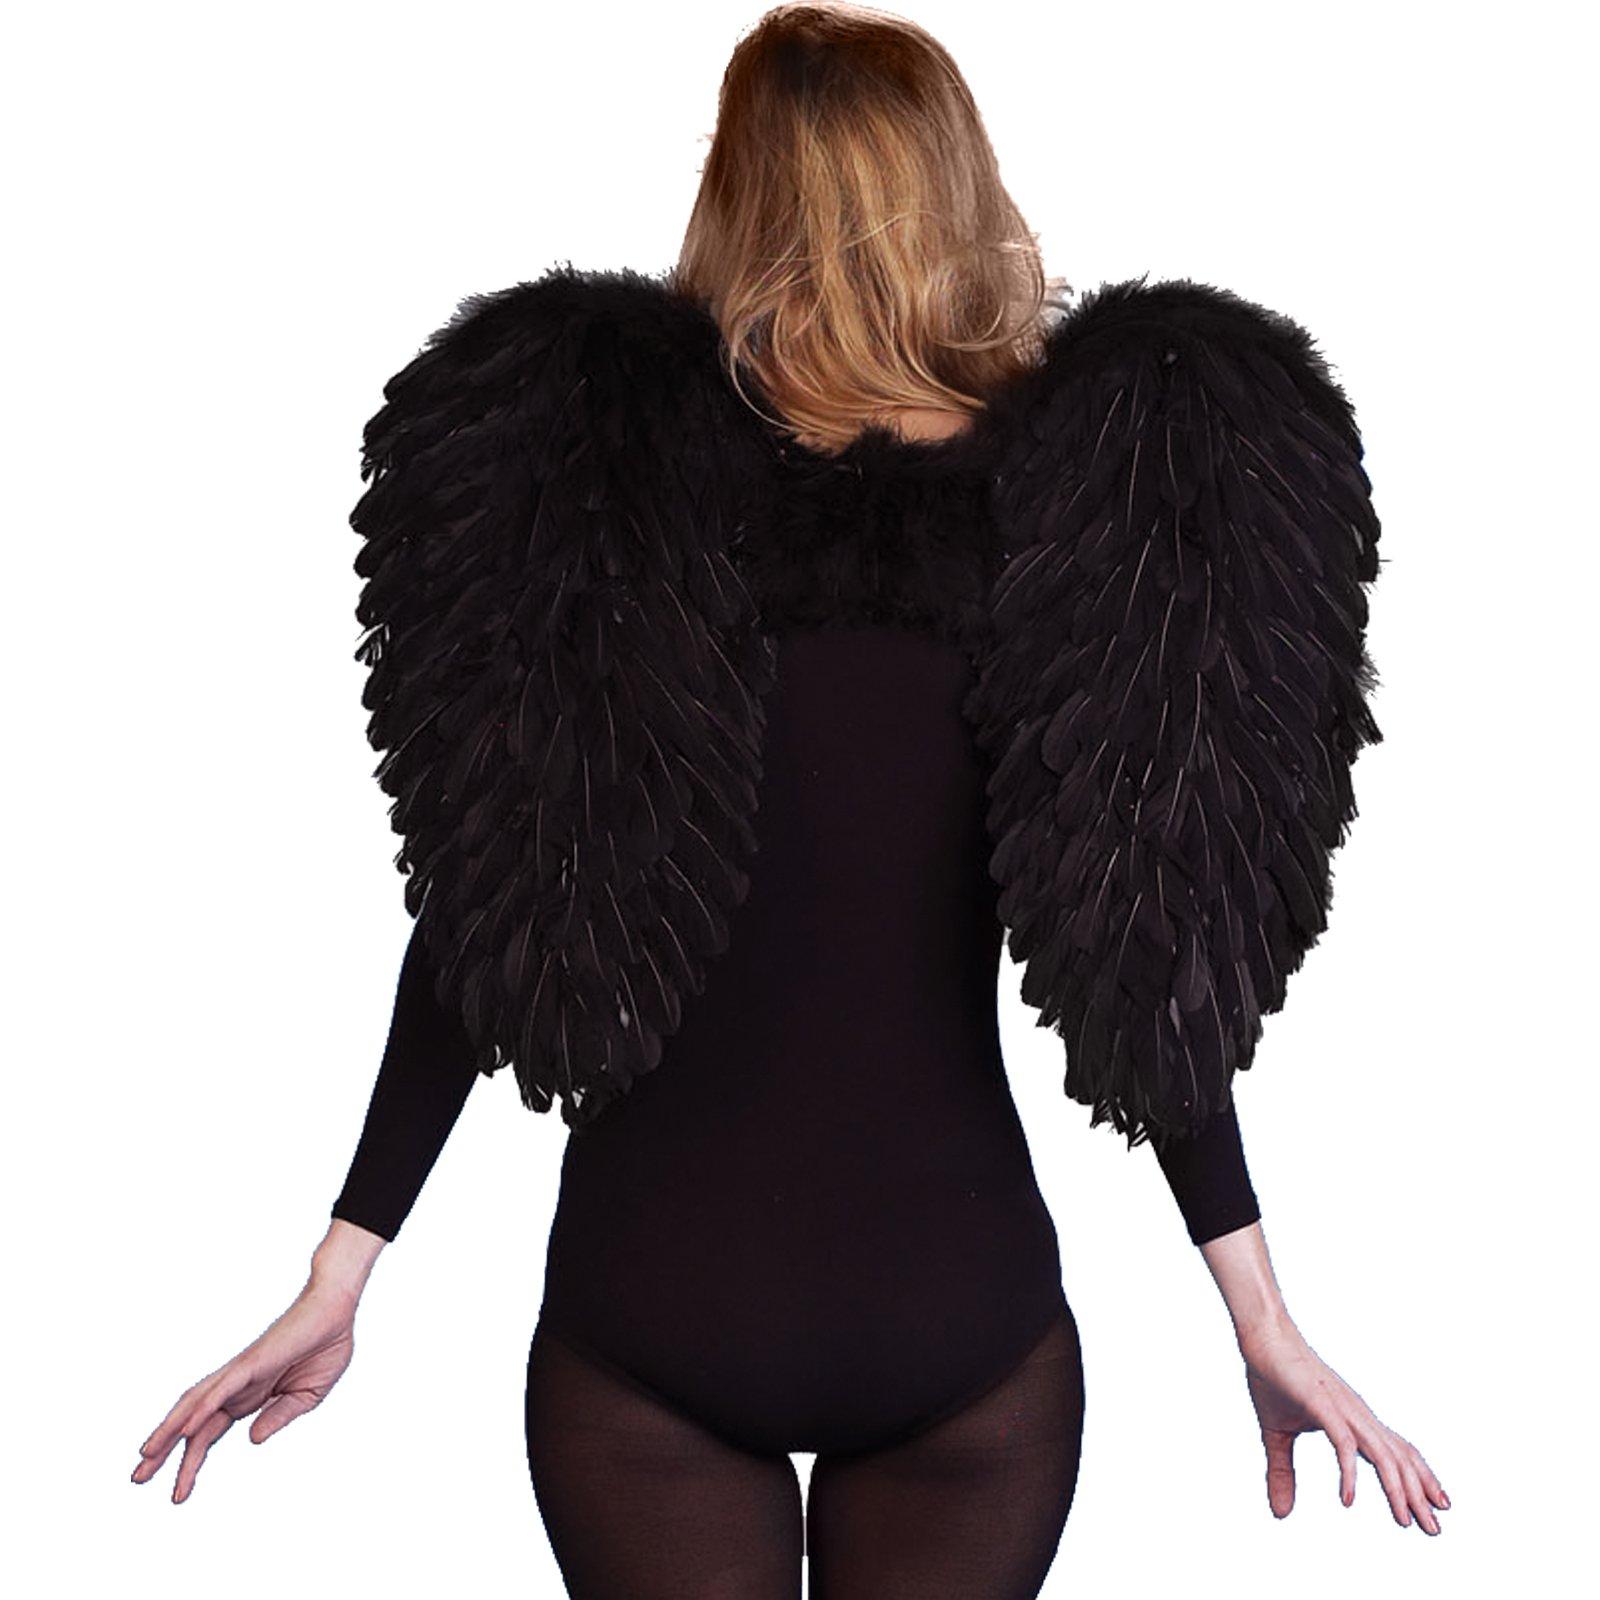 Fallen Angel Costume | Costumes FC